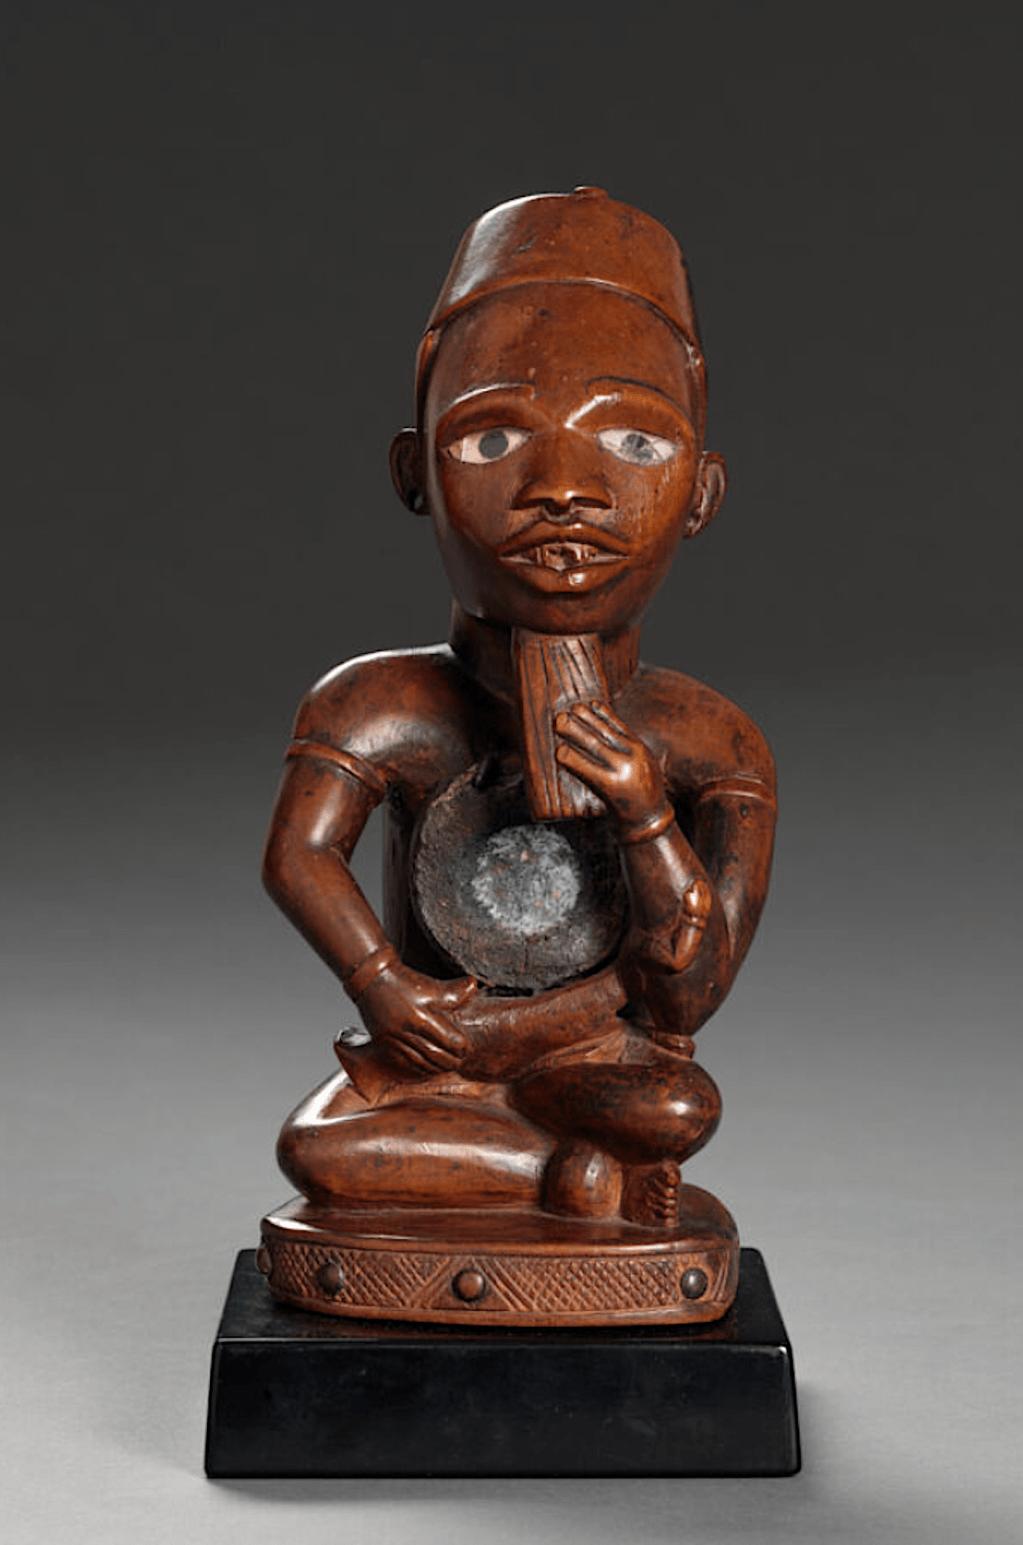 Pace African & Oceanic Art